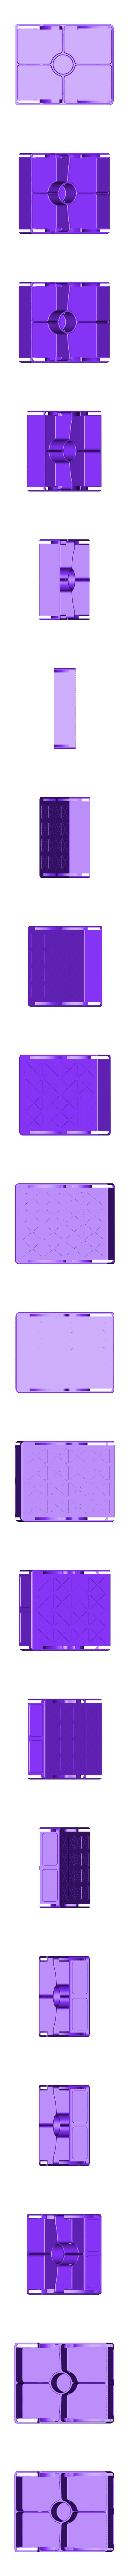 cont liv 3  2 pz.stl Download STL file Multiple container ( closed 180x370mm) construction Contenitore multipla trasportabile Multibox • 3D printable design, mikifly10